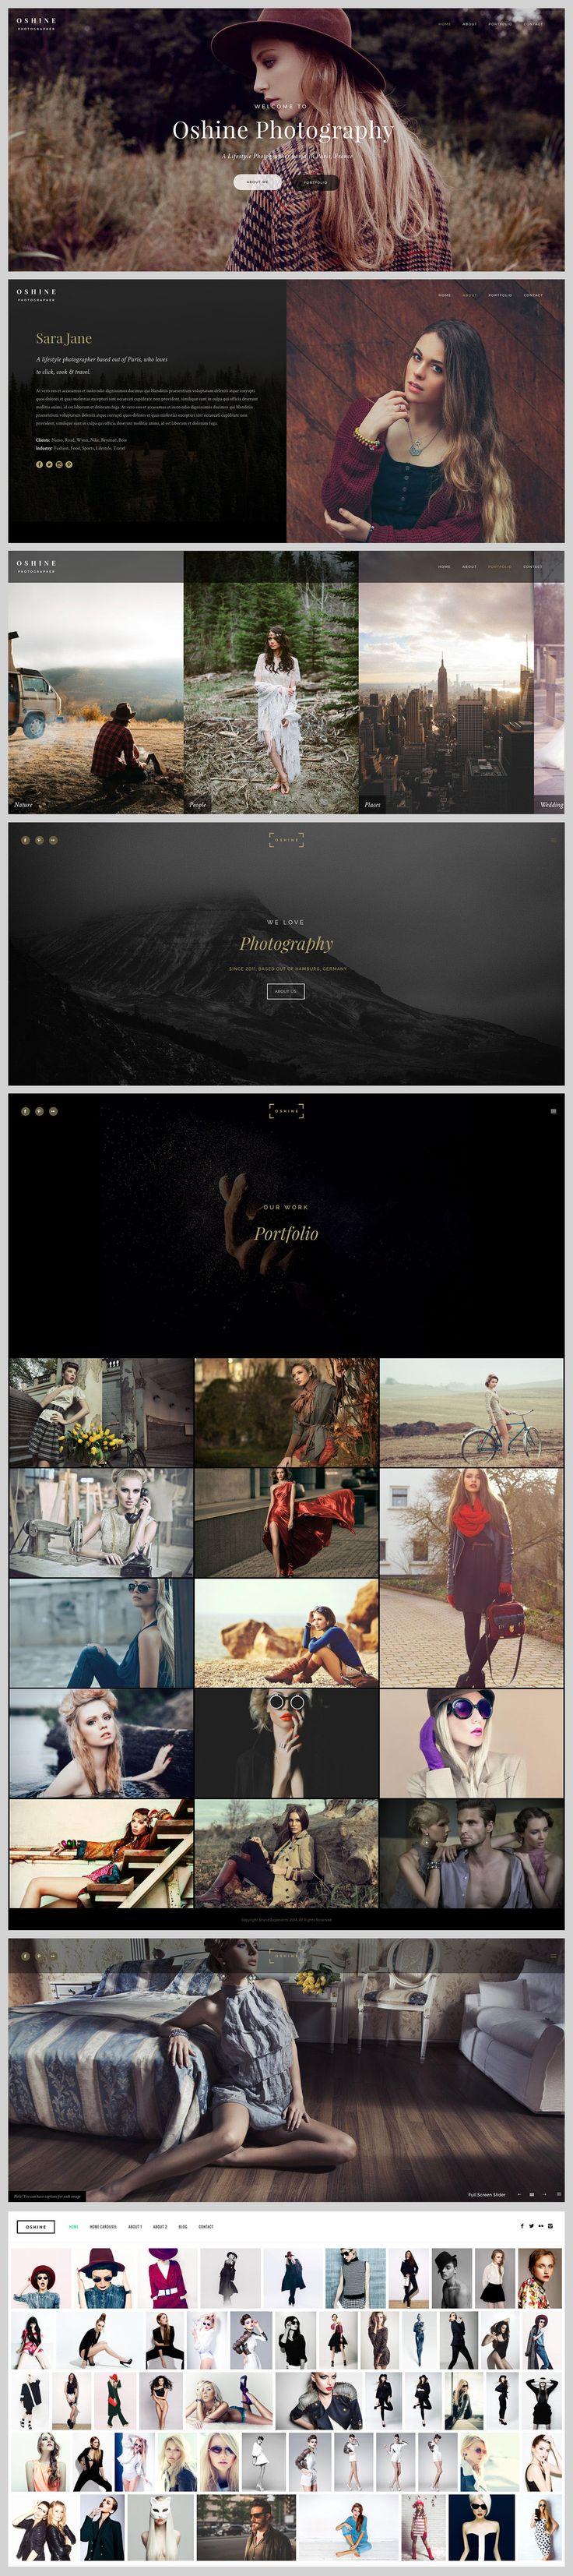 "Check out my @Behance project: ""Oshine - Creative Multi-Purpose Portfolio Theme"" https://www.behance.net/gallery/51624759/Oshine-Creative-Multi-Purpose-Portfolio-Theme"